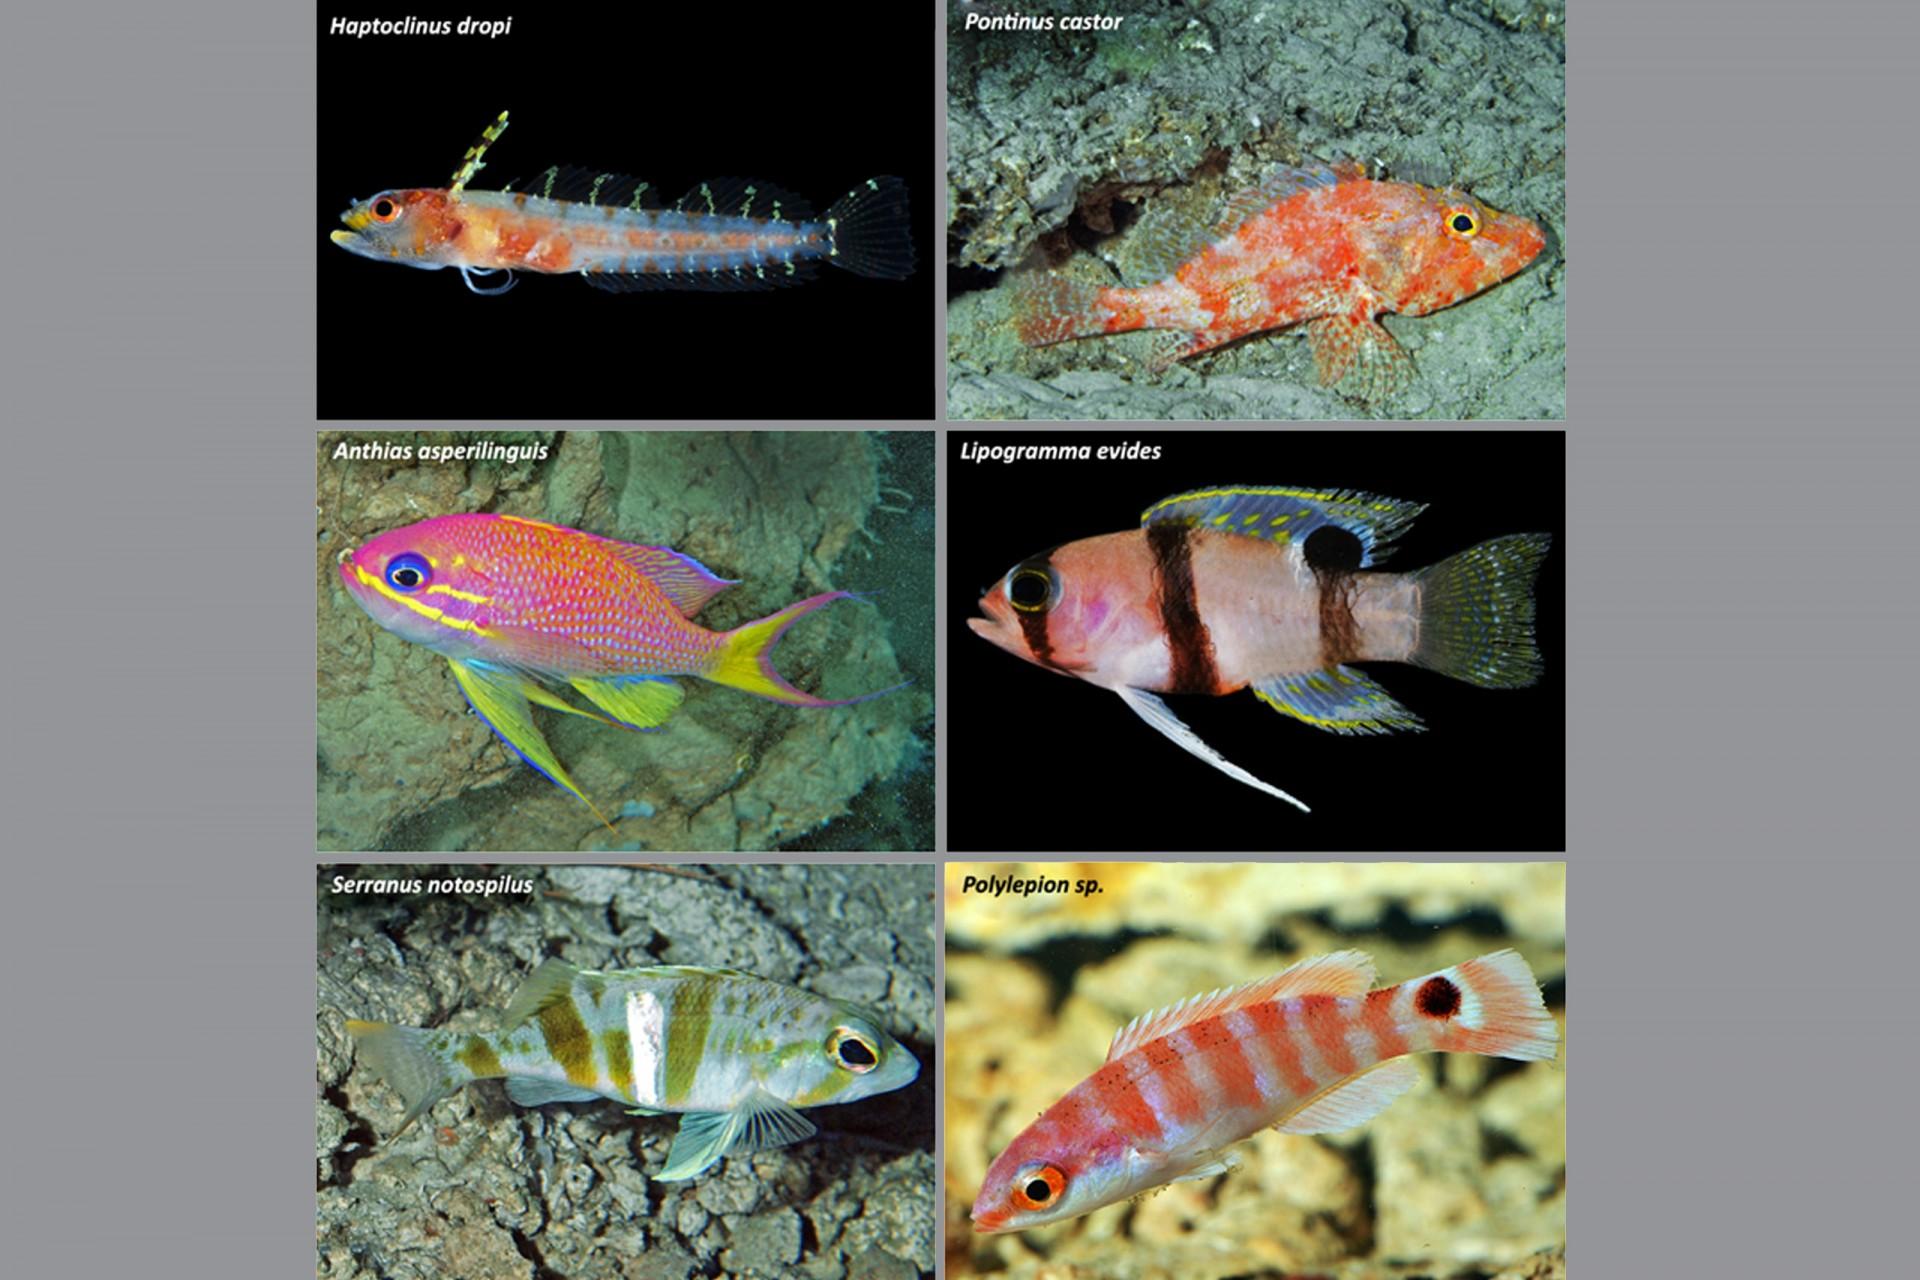 Representative Caribbean fishes inhabiting the rariphotic zone off Curaçao